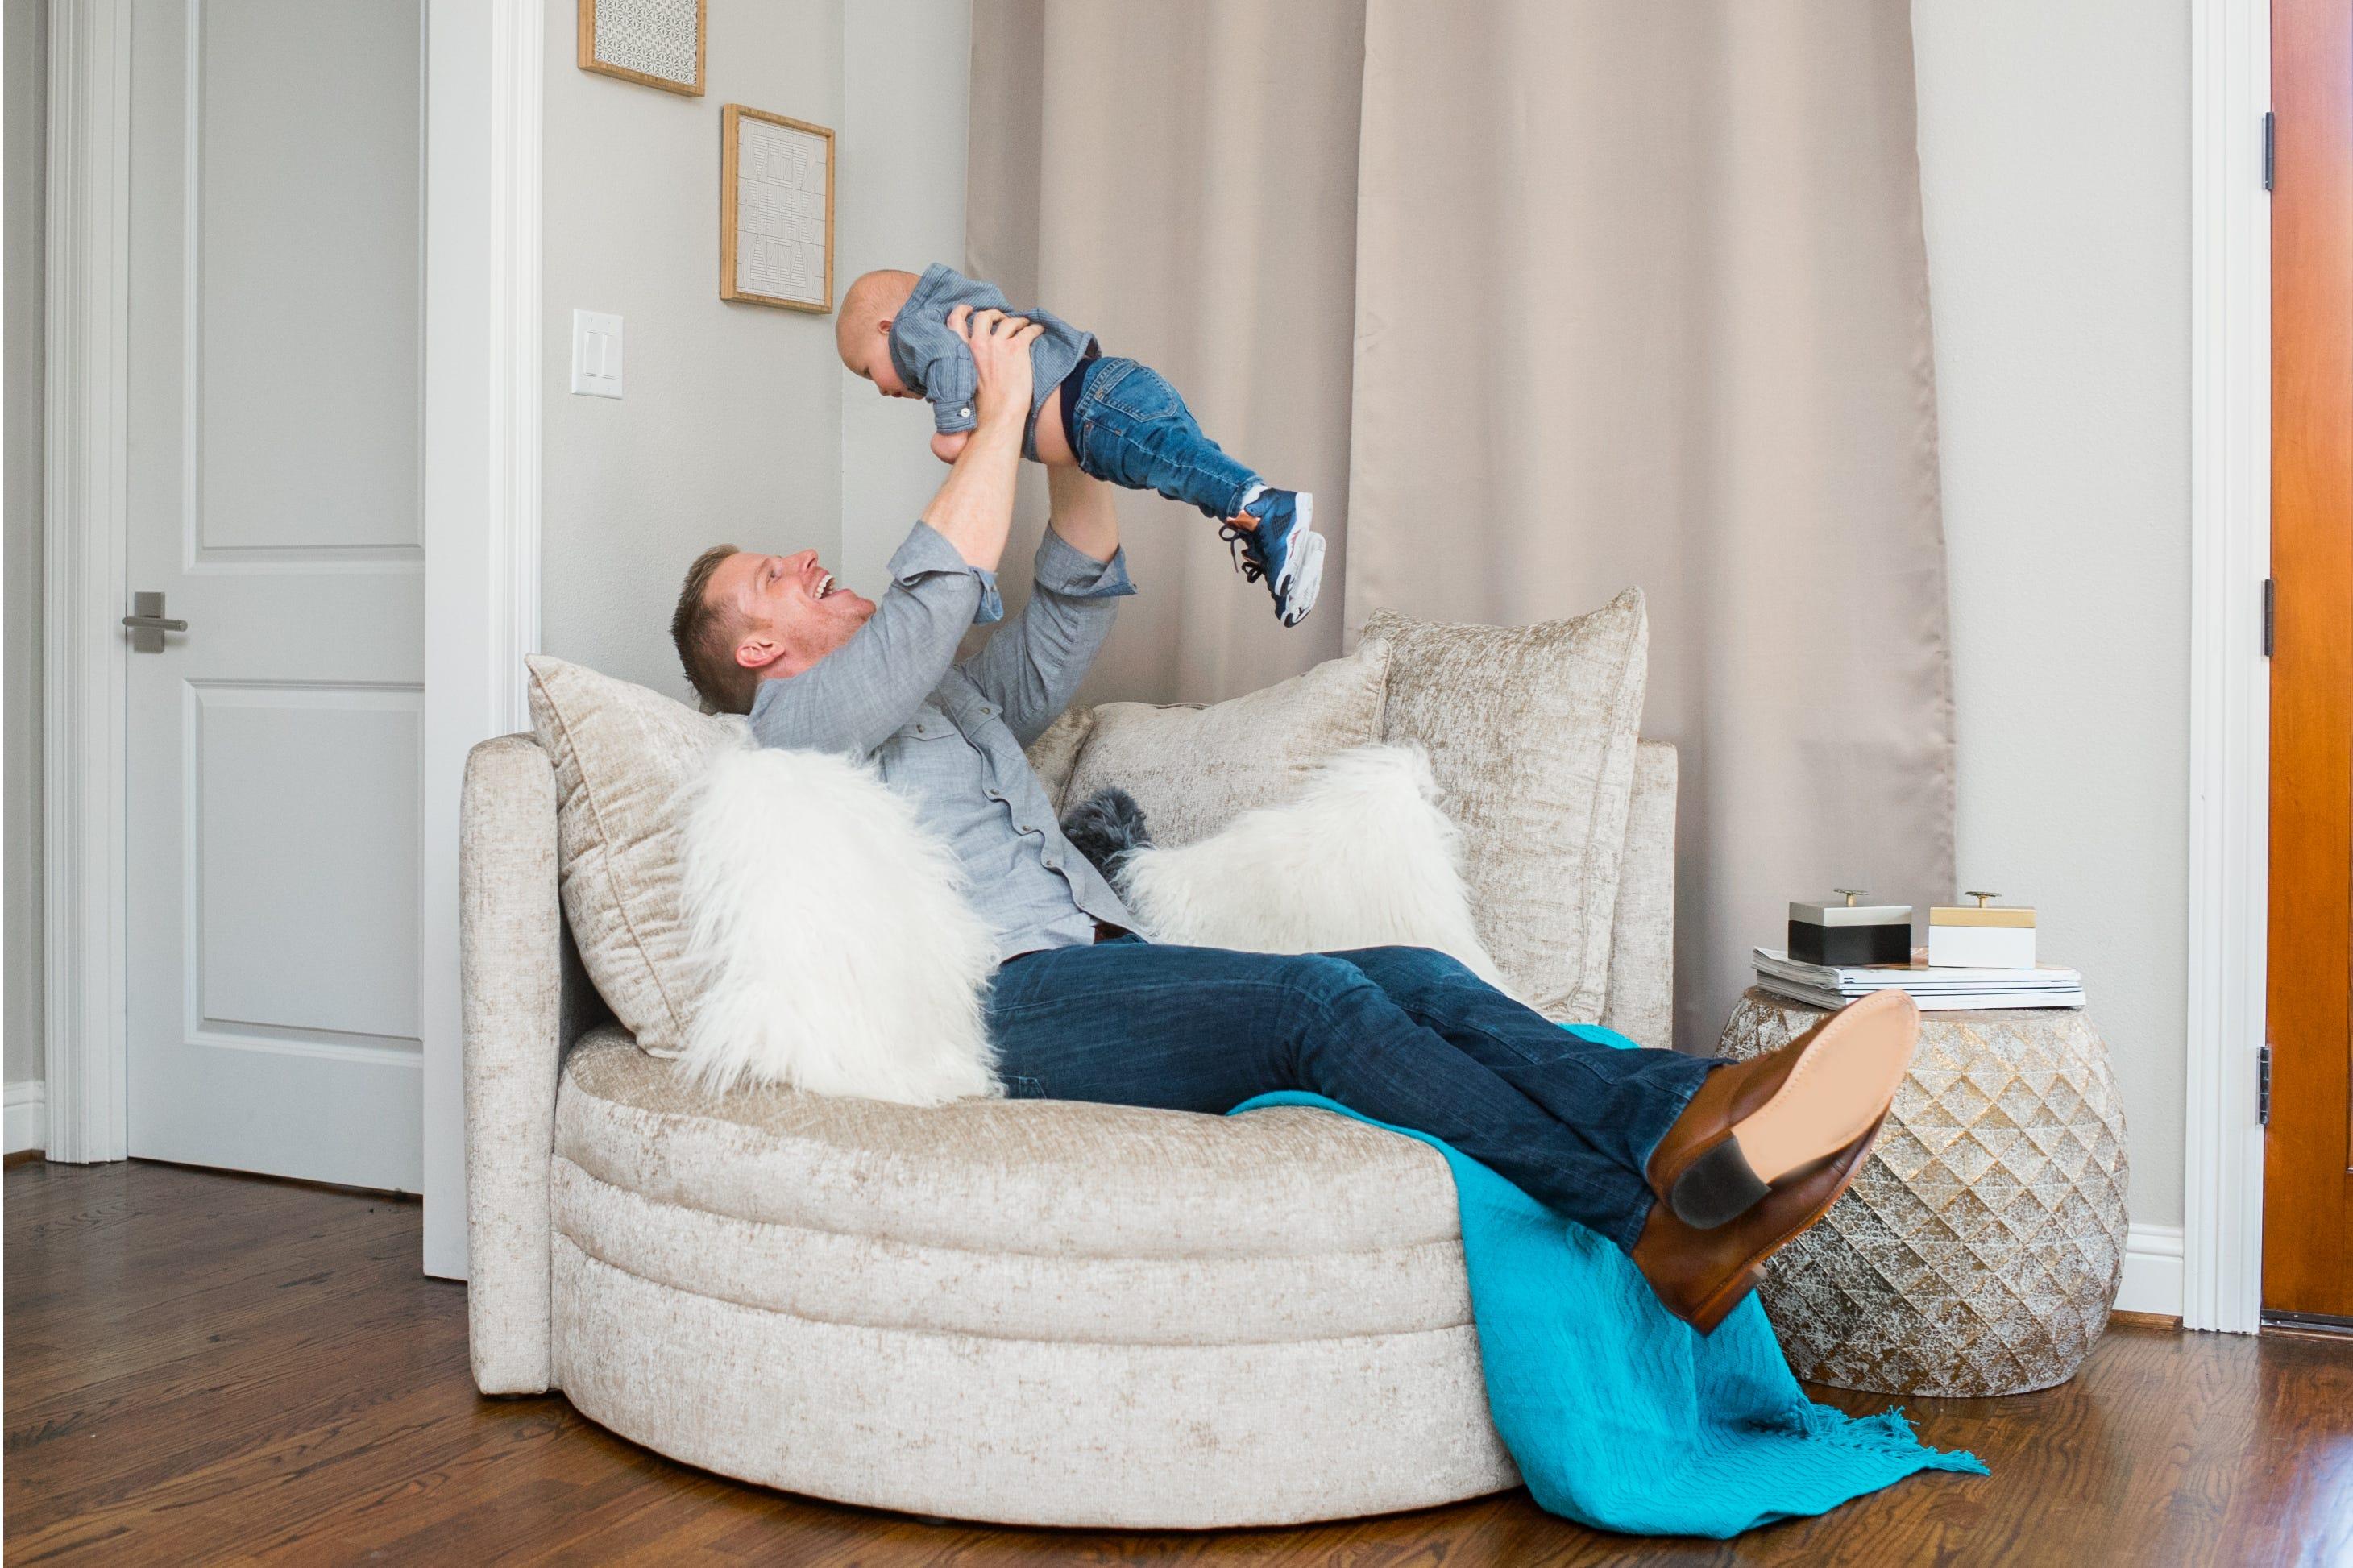 Surprising Wayfair The Bachelor Sean Catherine Lowe Sofa Chairs Dailytribune Chair Design For Home Dailytribuneorg